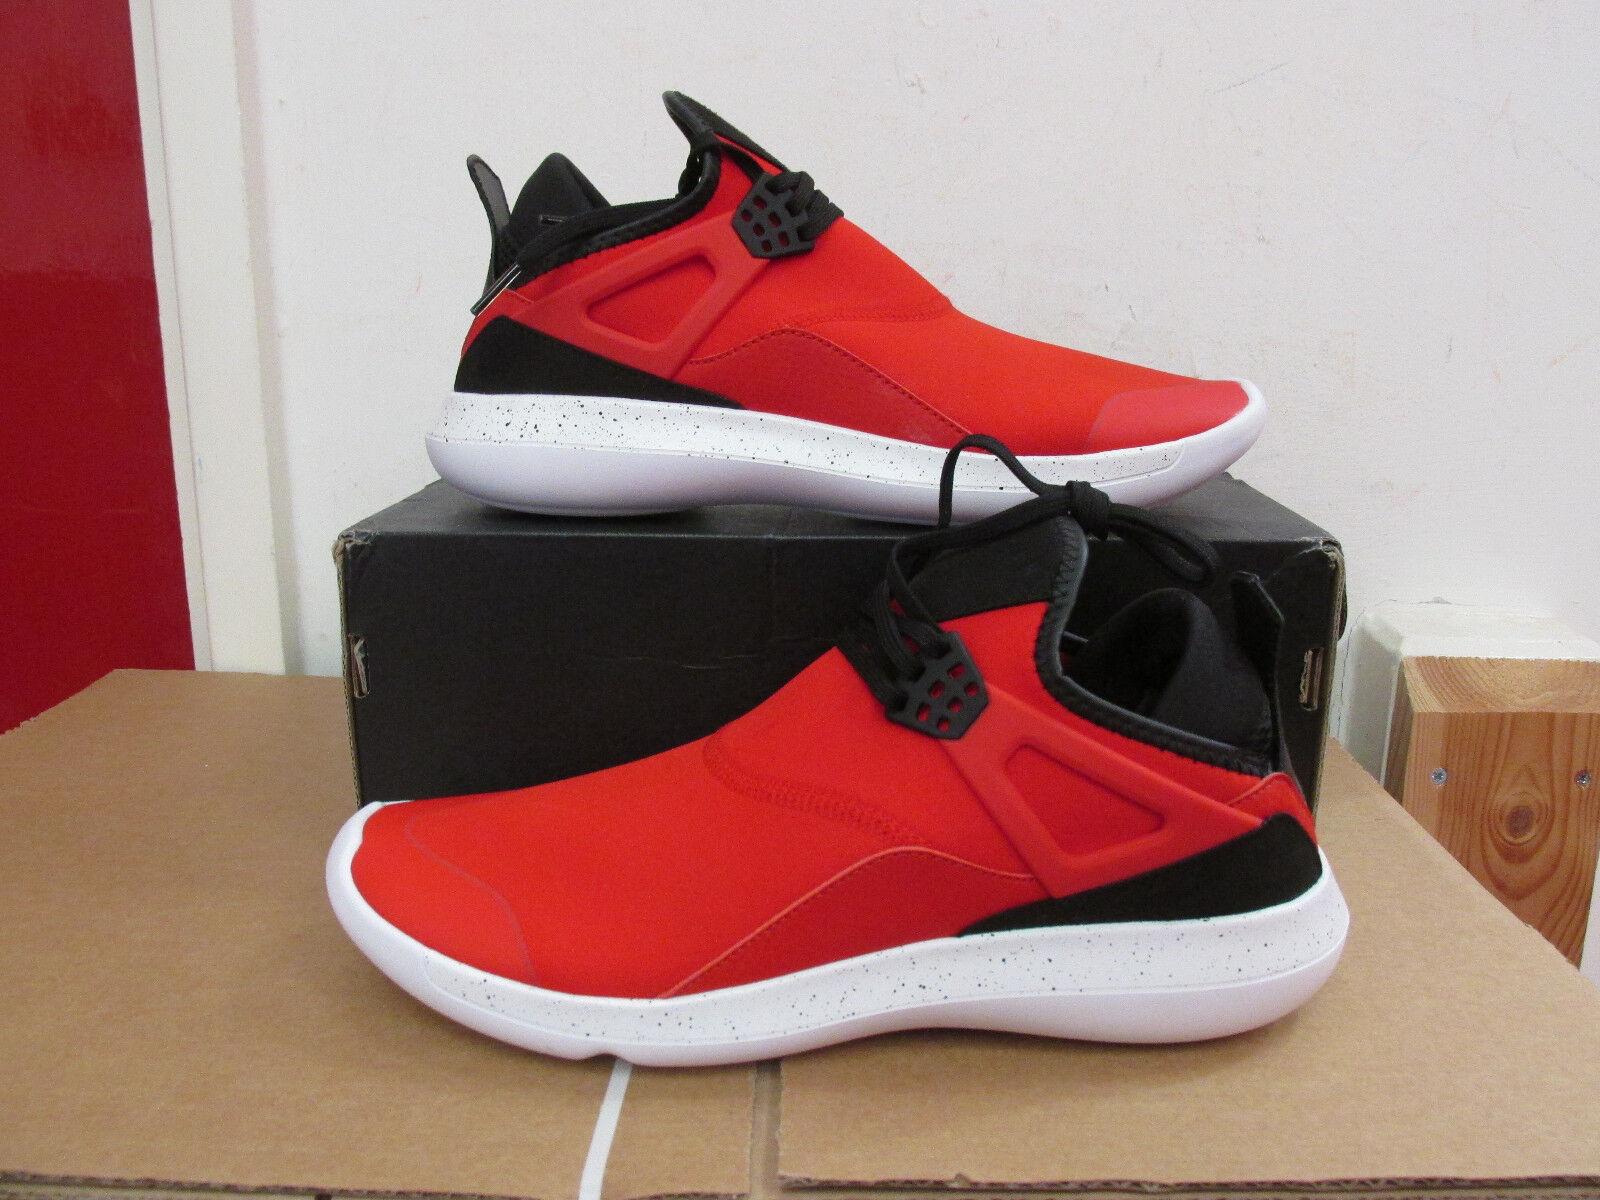 Nike air jordan volare 89 Uomo formatori 940267 601 scarpe scarpe clearance